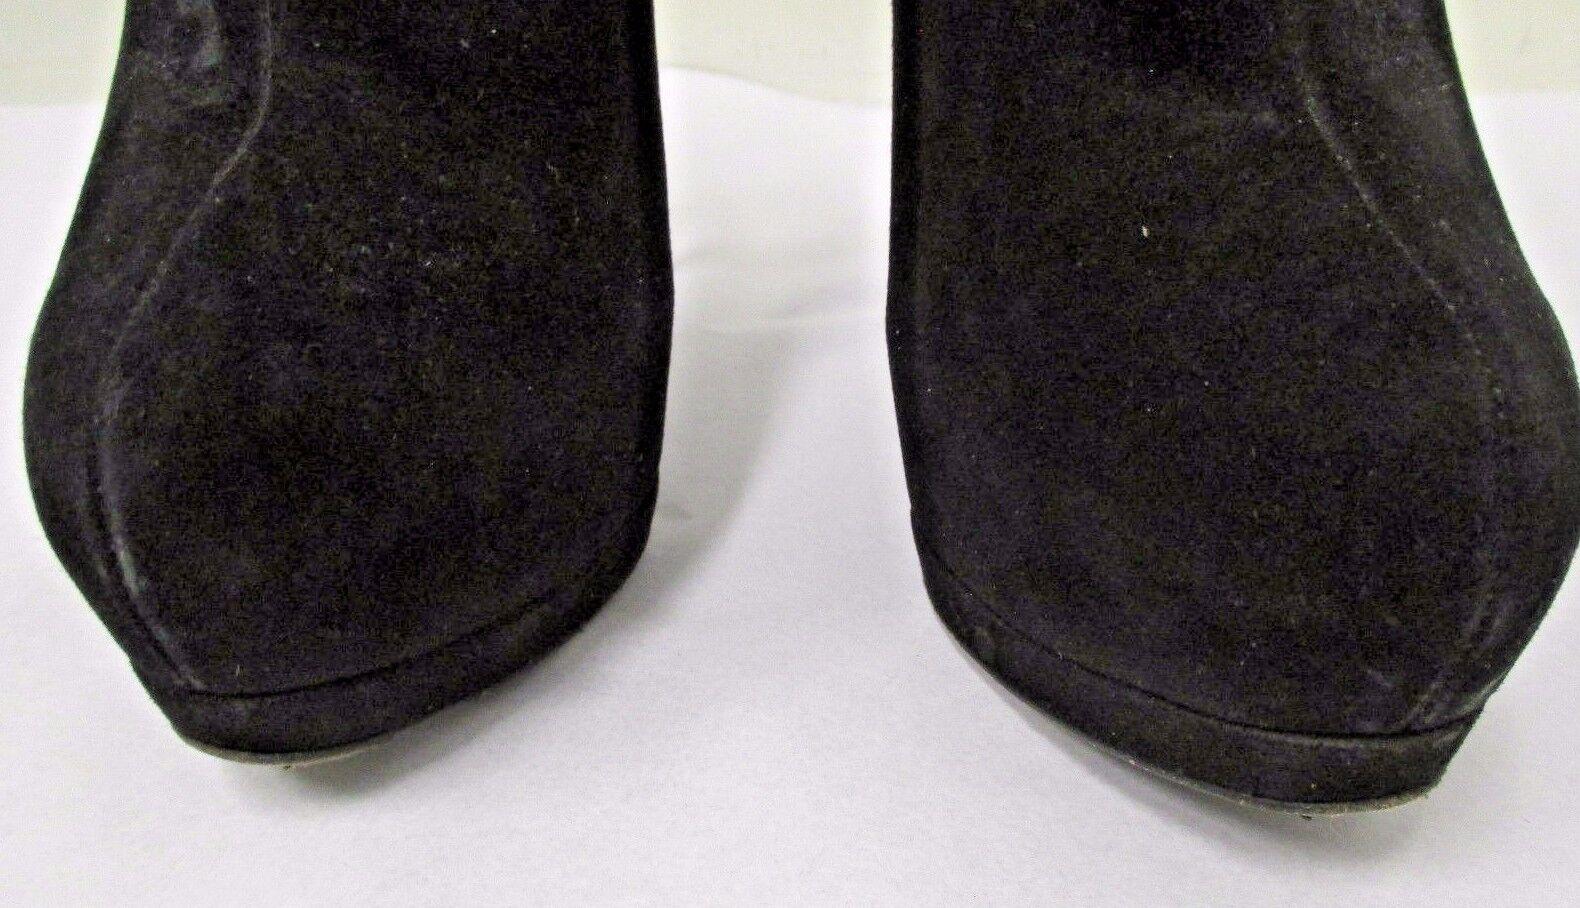 GIUSEPPE GIUSEPPE GIUSEPPE ZANOTTI Black Suede Simple Platform Ankle Booties w  Zipper  - Size 40 22860b